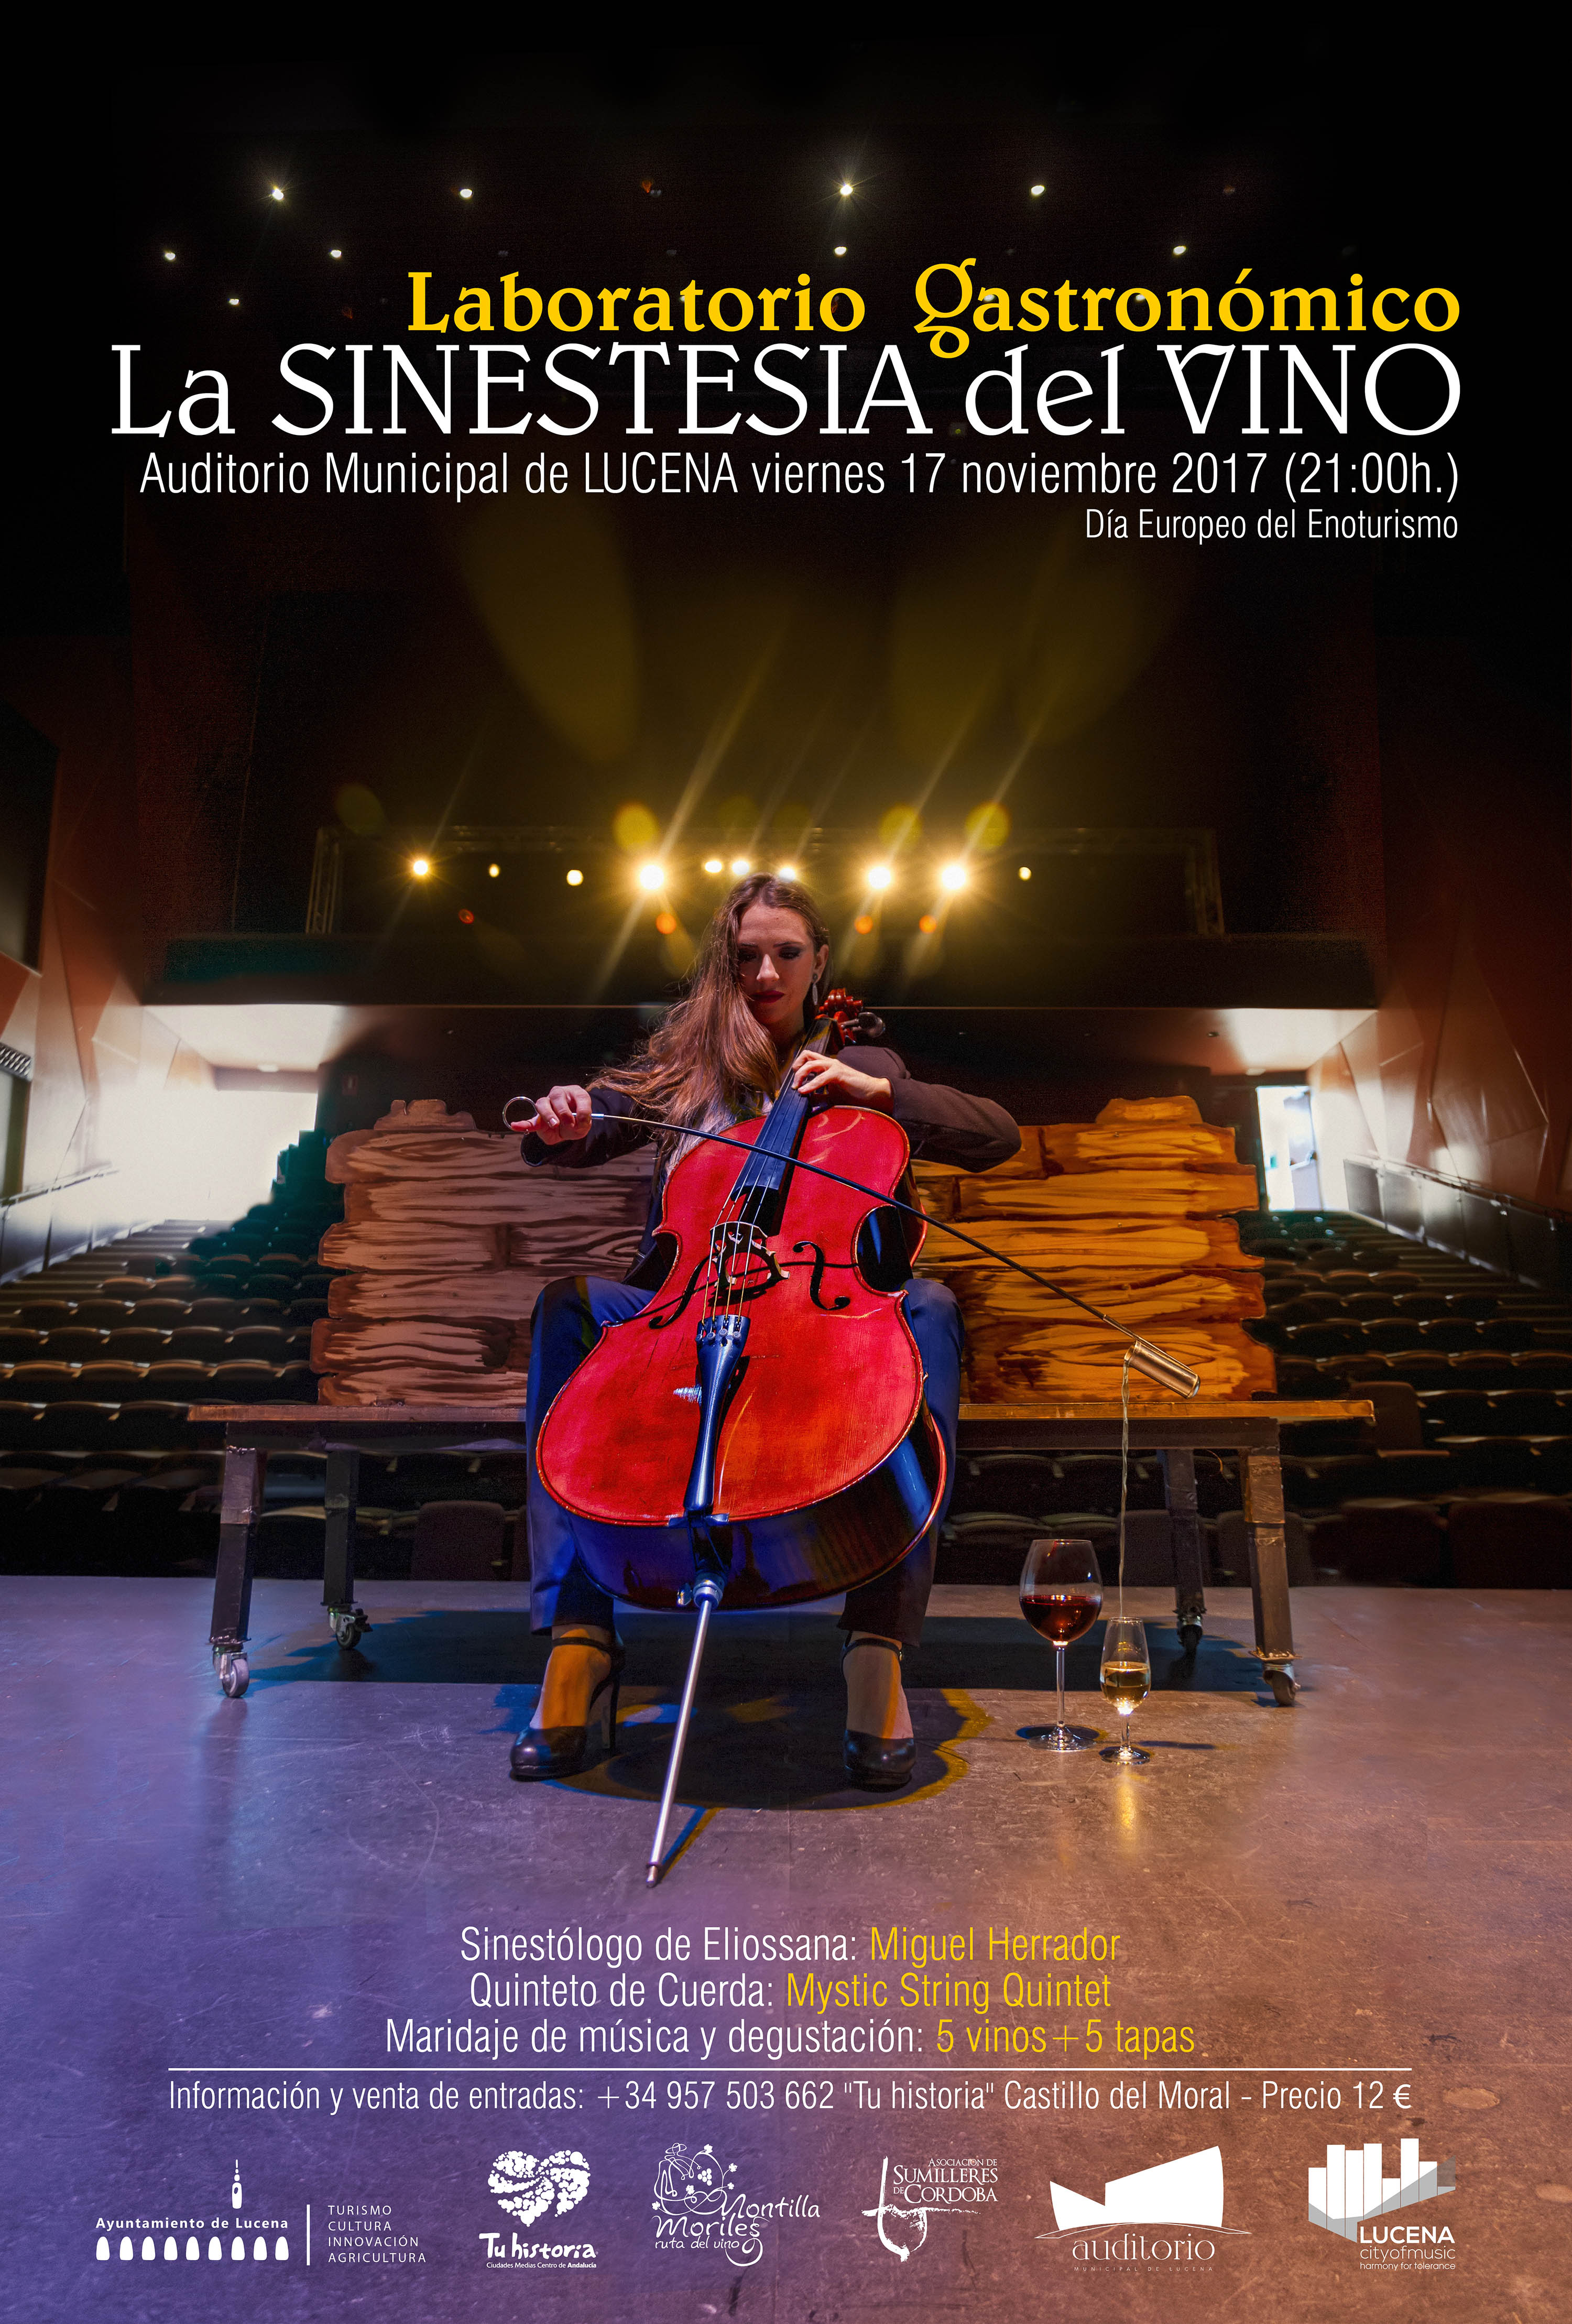 Laboratorio Enogastronómico: La sinestesia del vino @ Auditorio Municipal